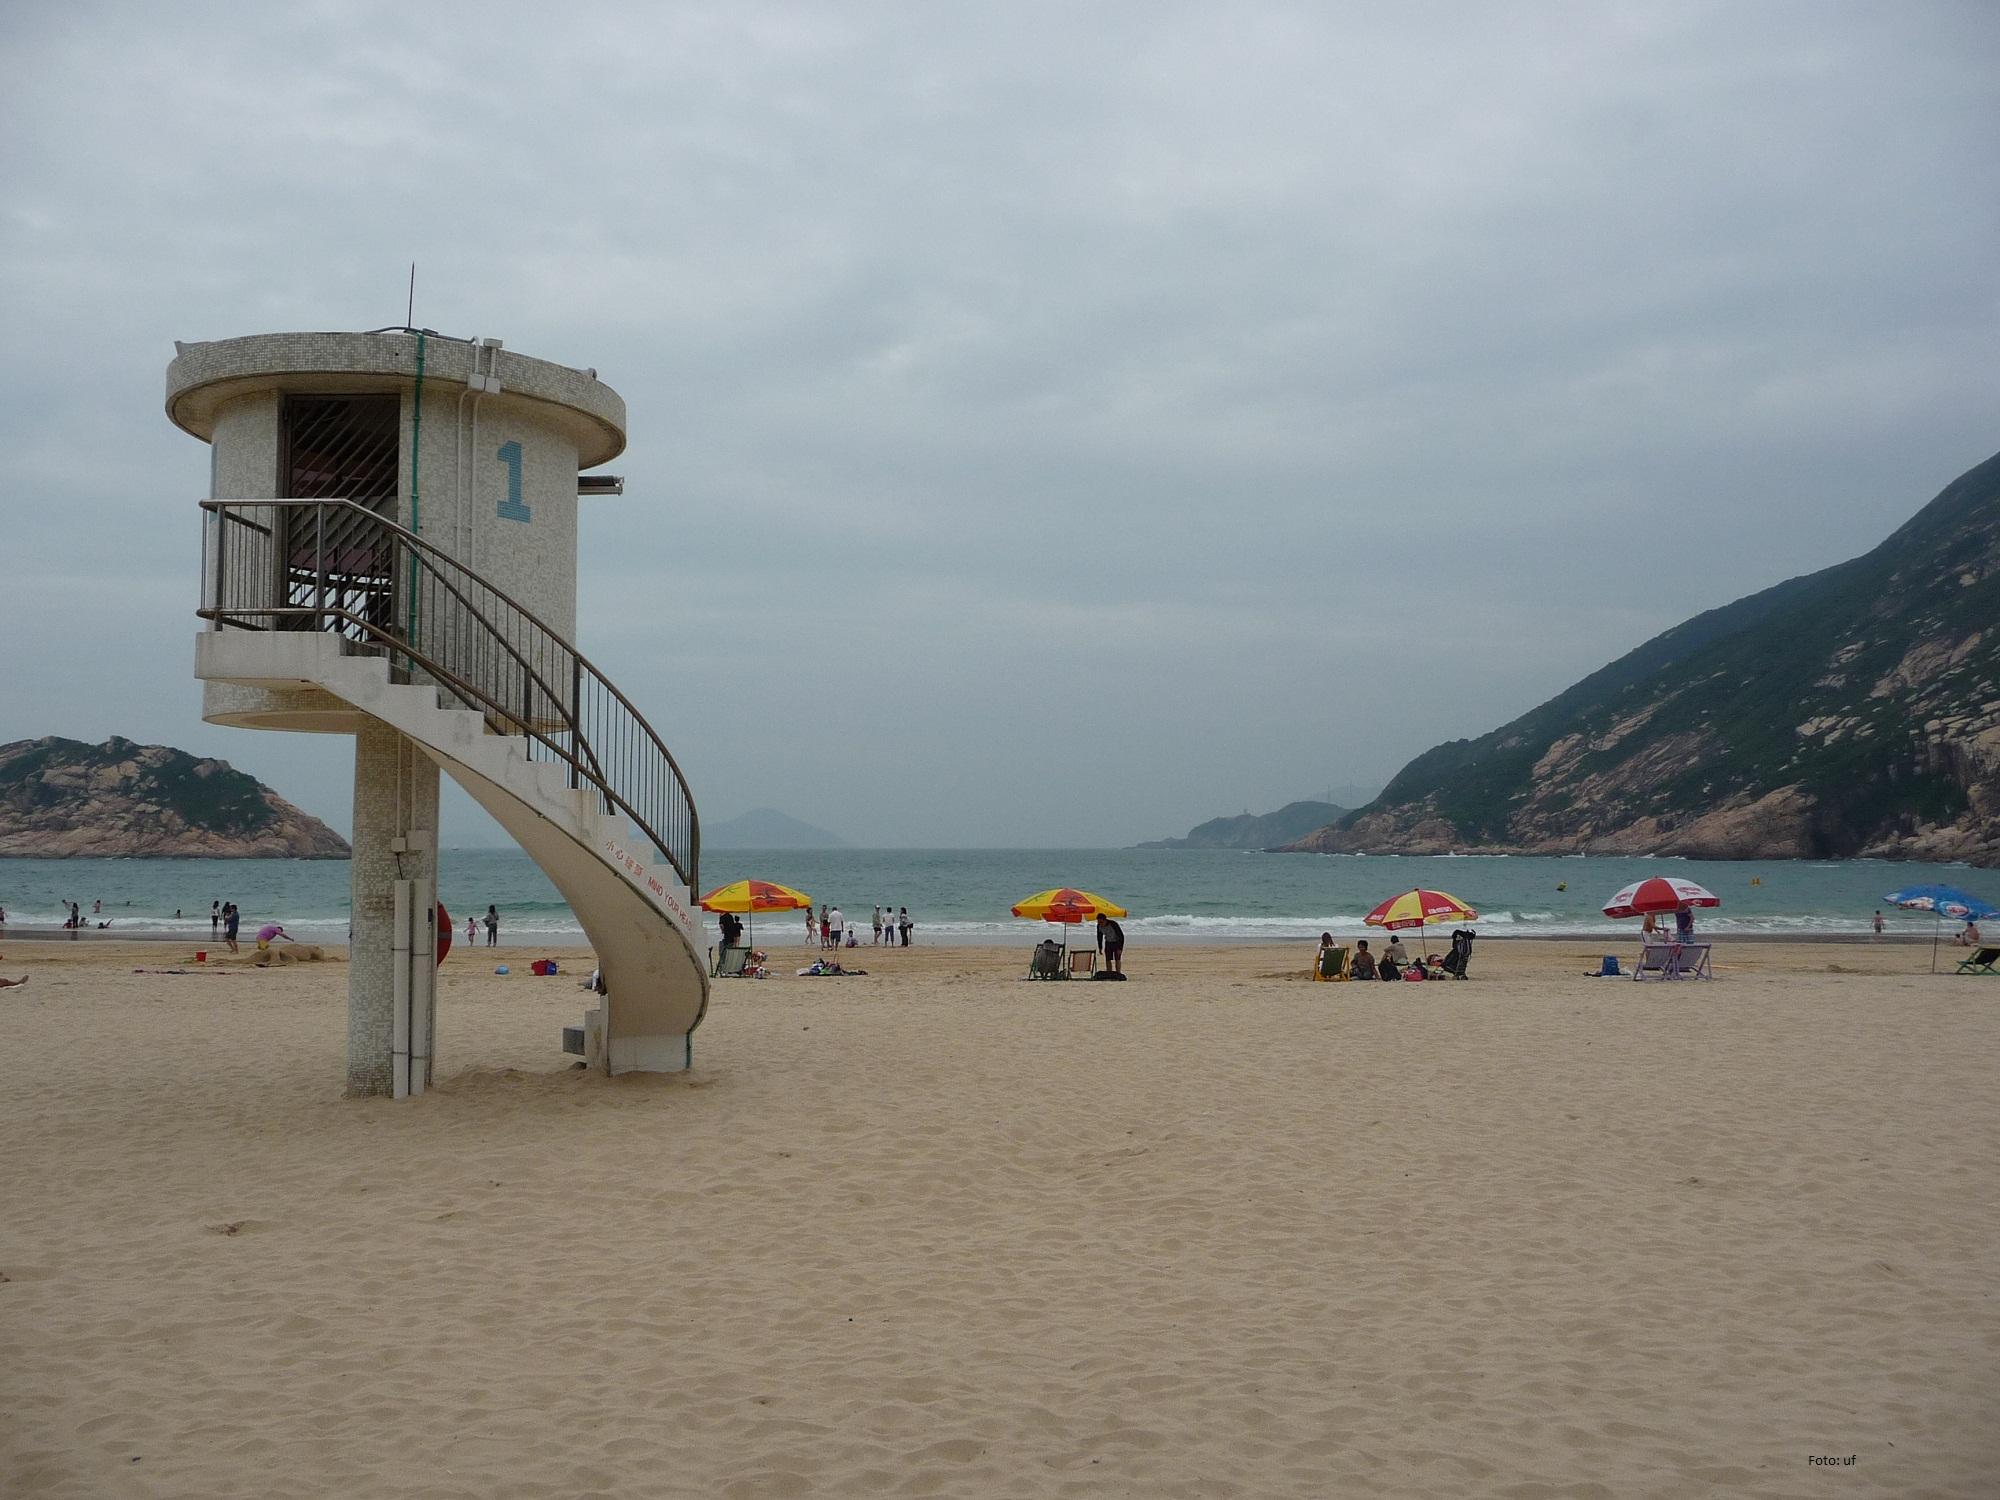 für einen Badetag in Hongkong wunderbar - Strand bei Shek O